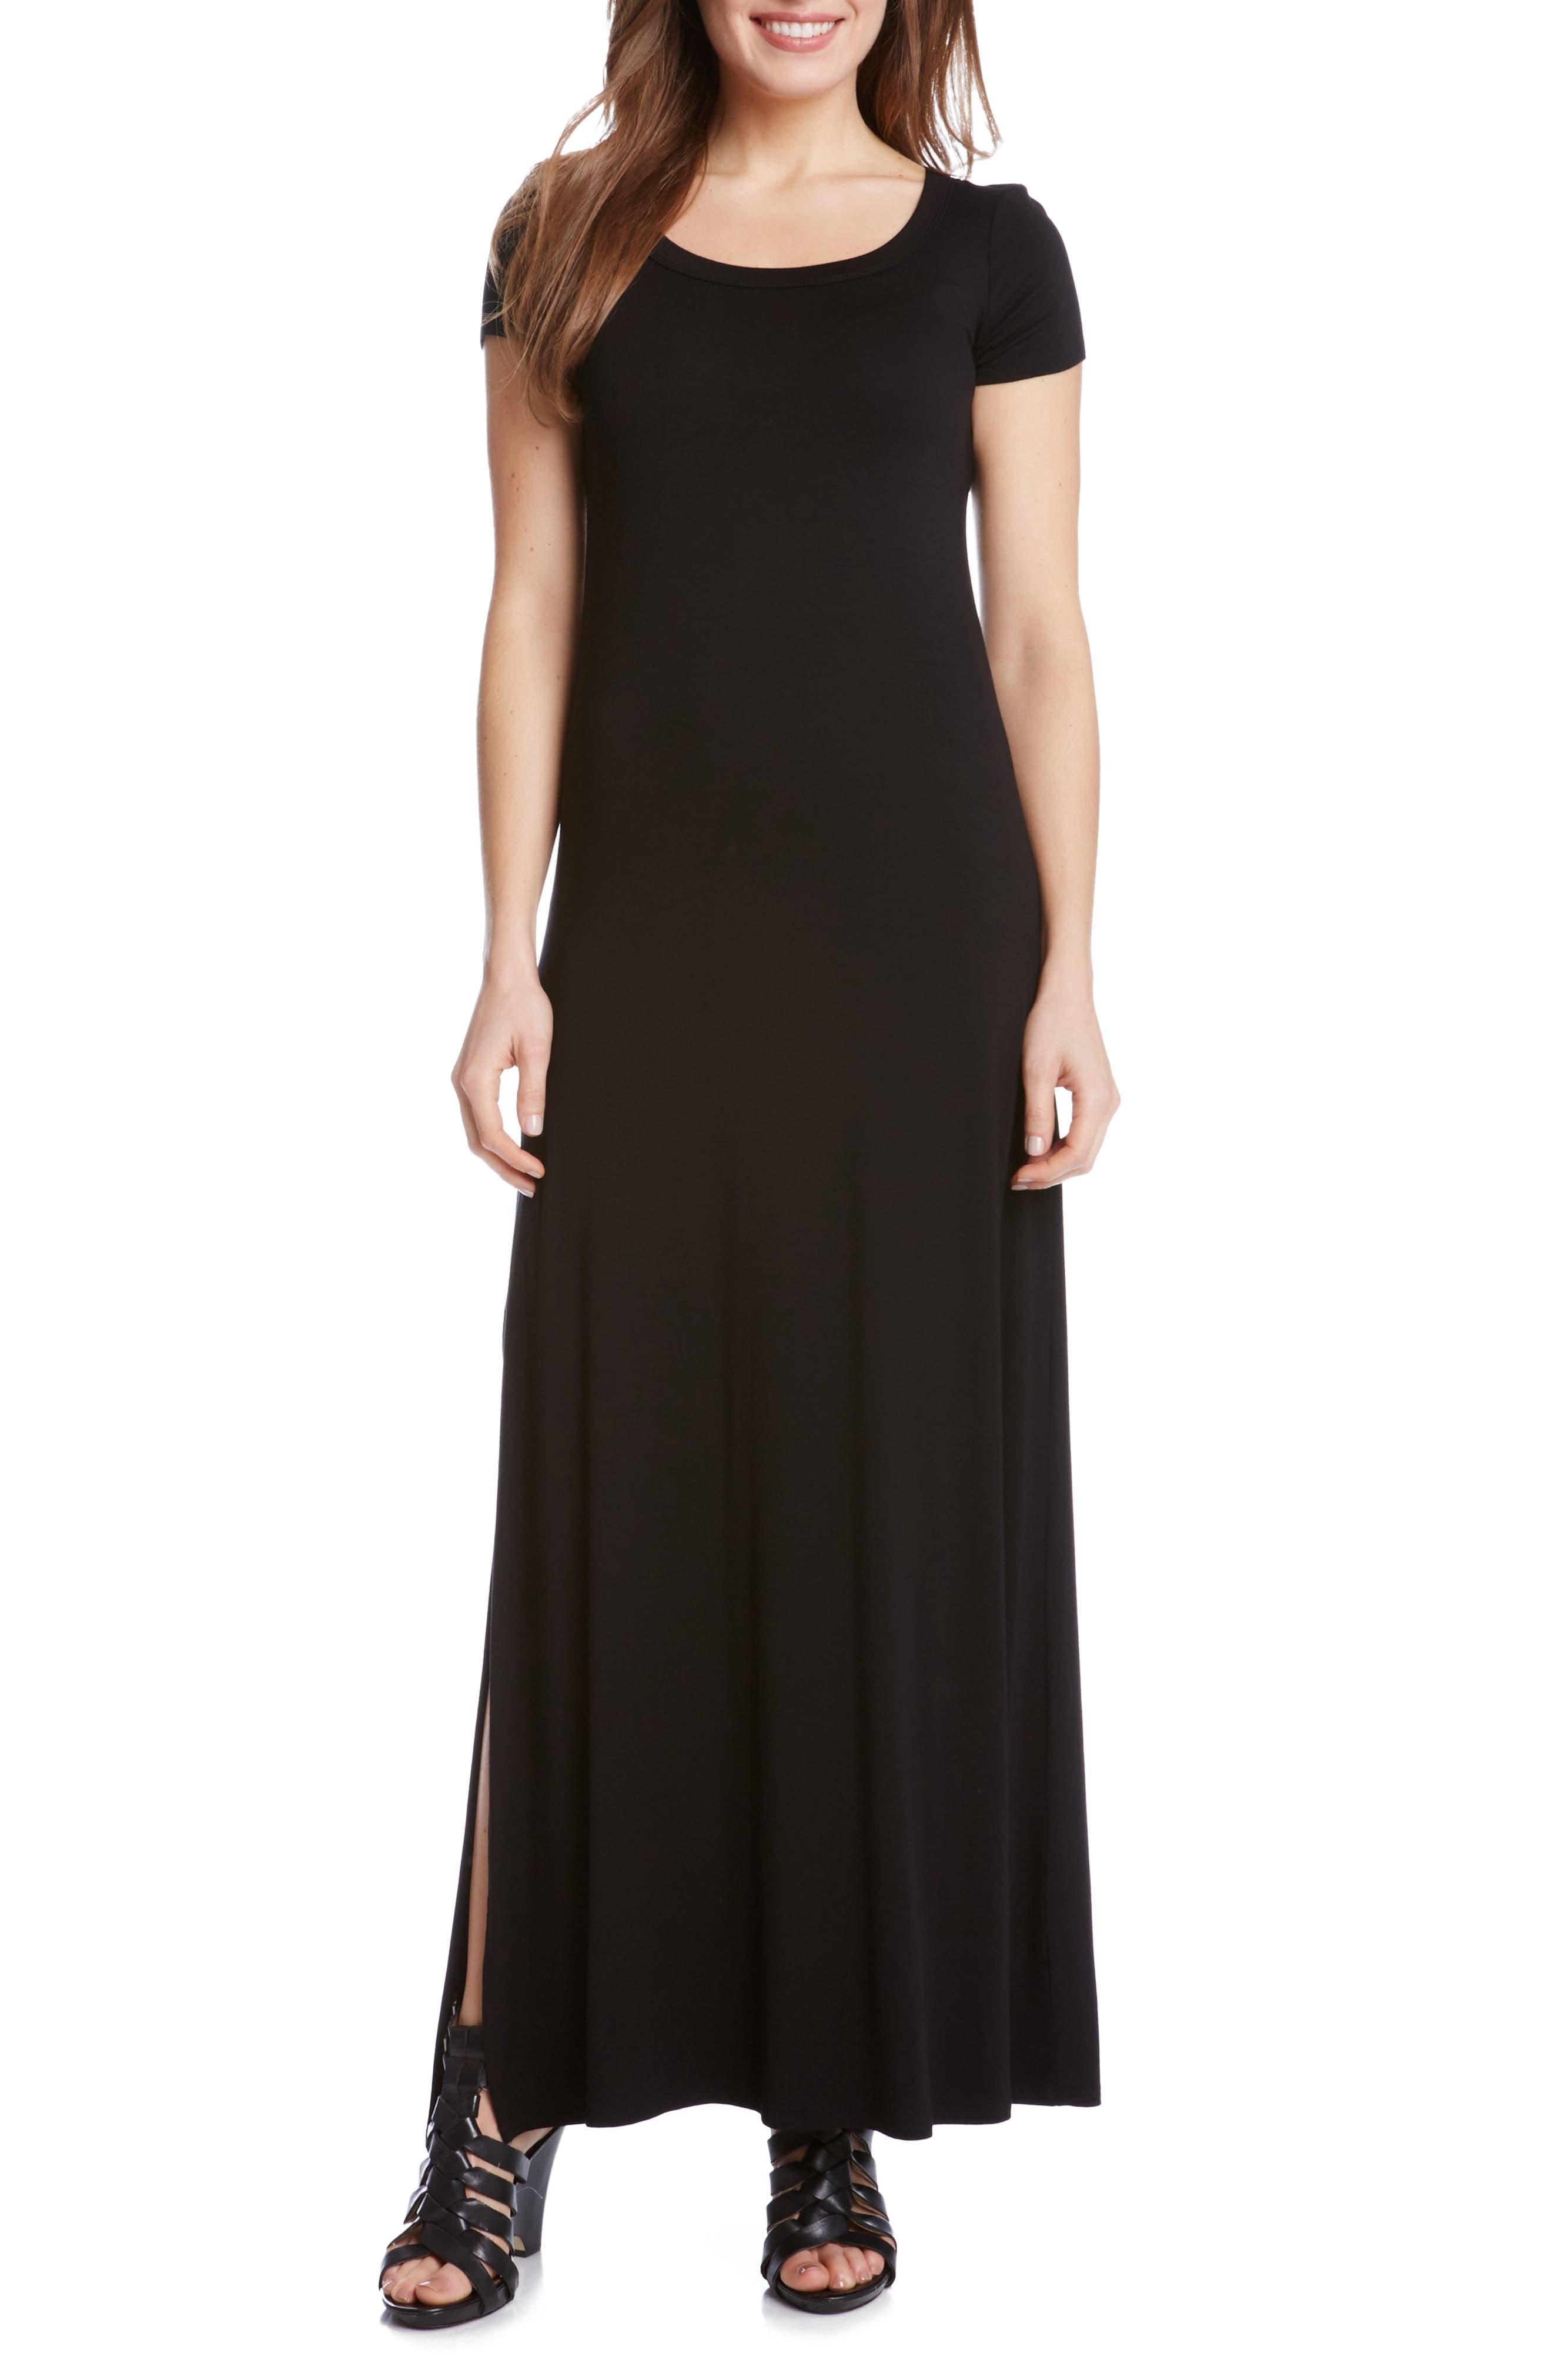 Alternate Image 1 Selected - Karen Kane Cap Sleeve Jersey Maxi Dress (Petite)